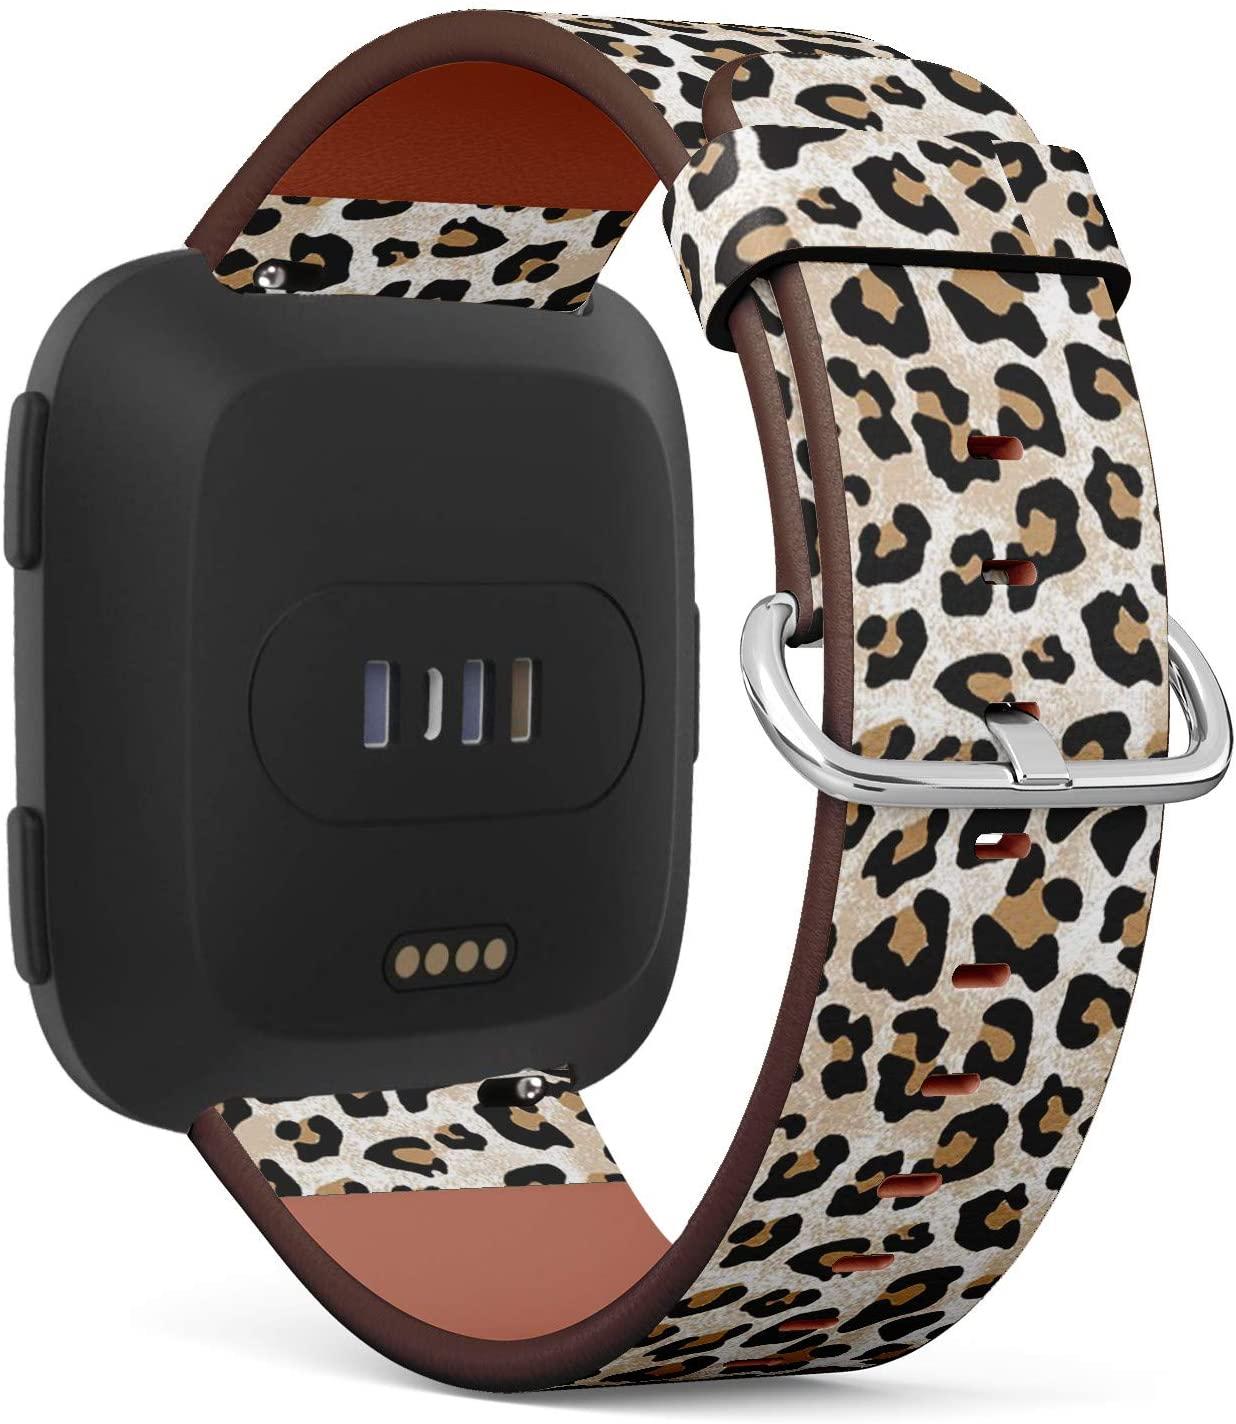 Compatible with Fitbit Versa/Versa 2 / Versa LITE - Leather Watch Wrist Band Strap Bracelet with Quick-Release Pins (Modern Leopard)